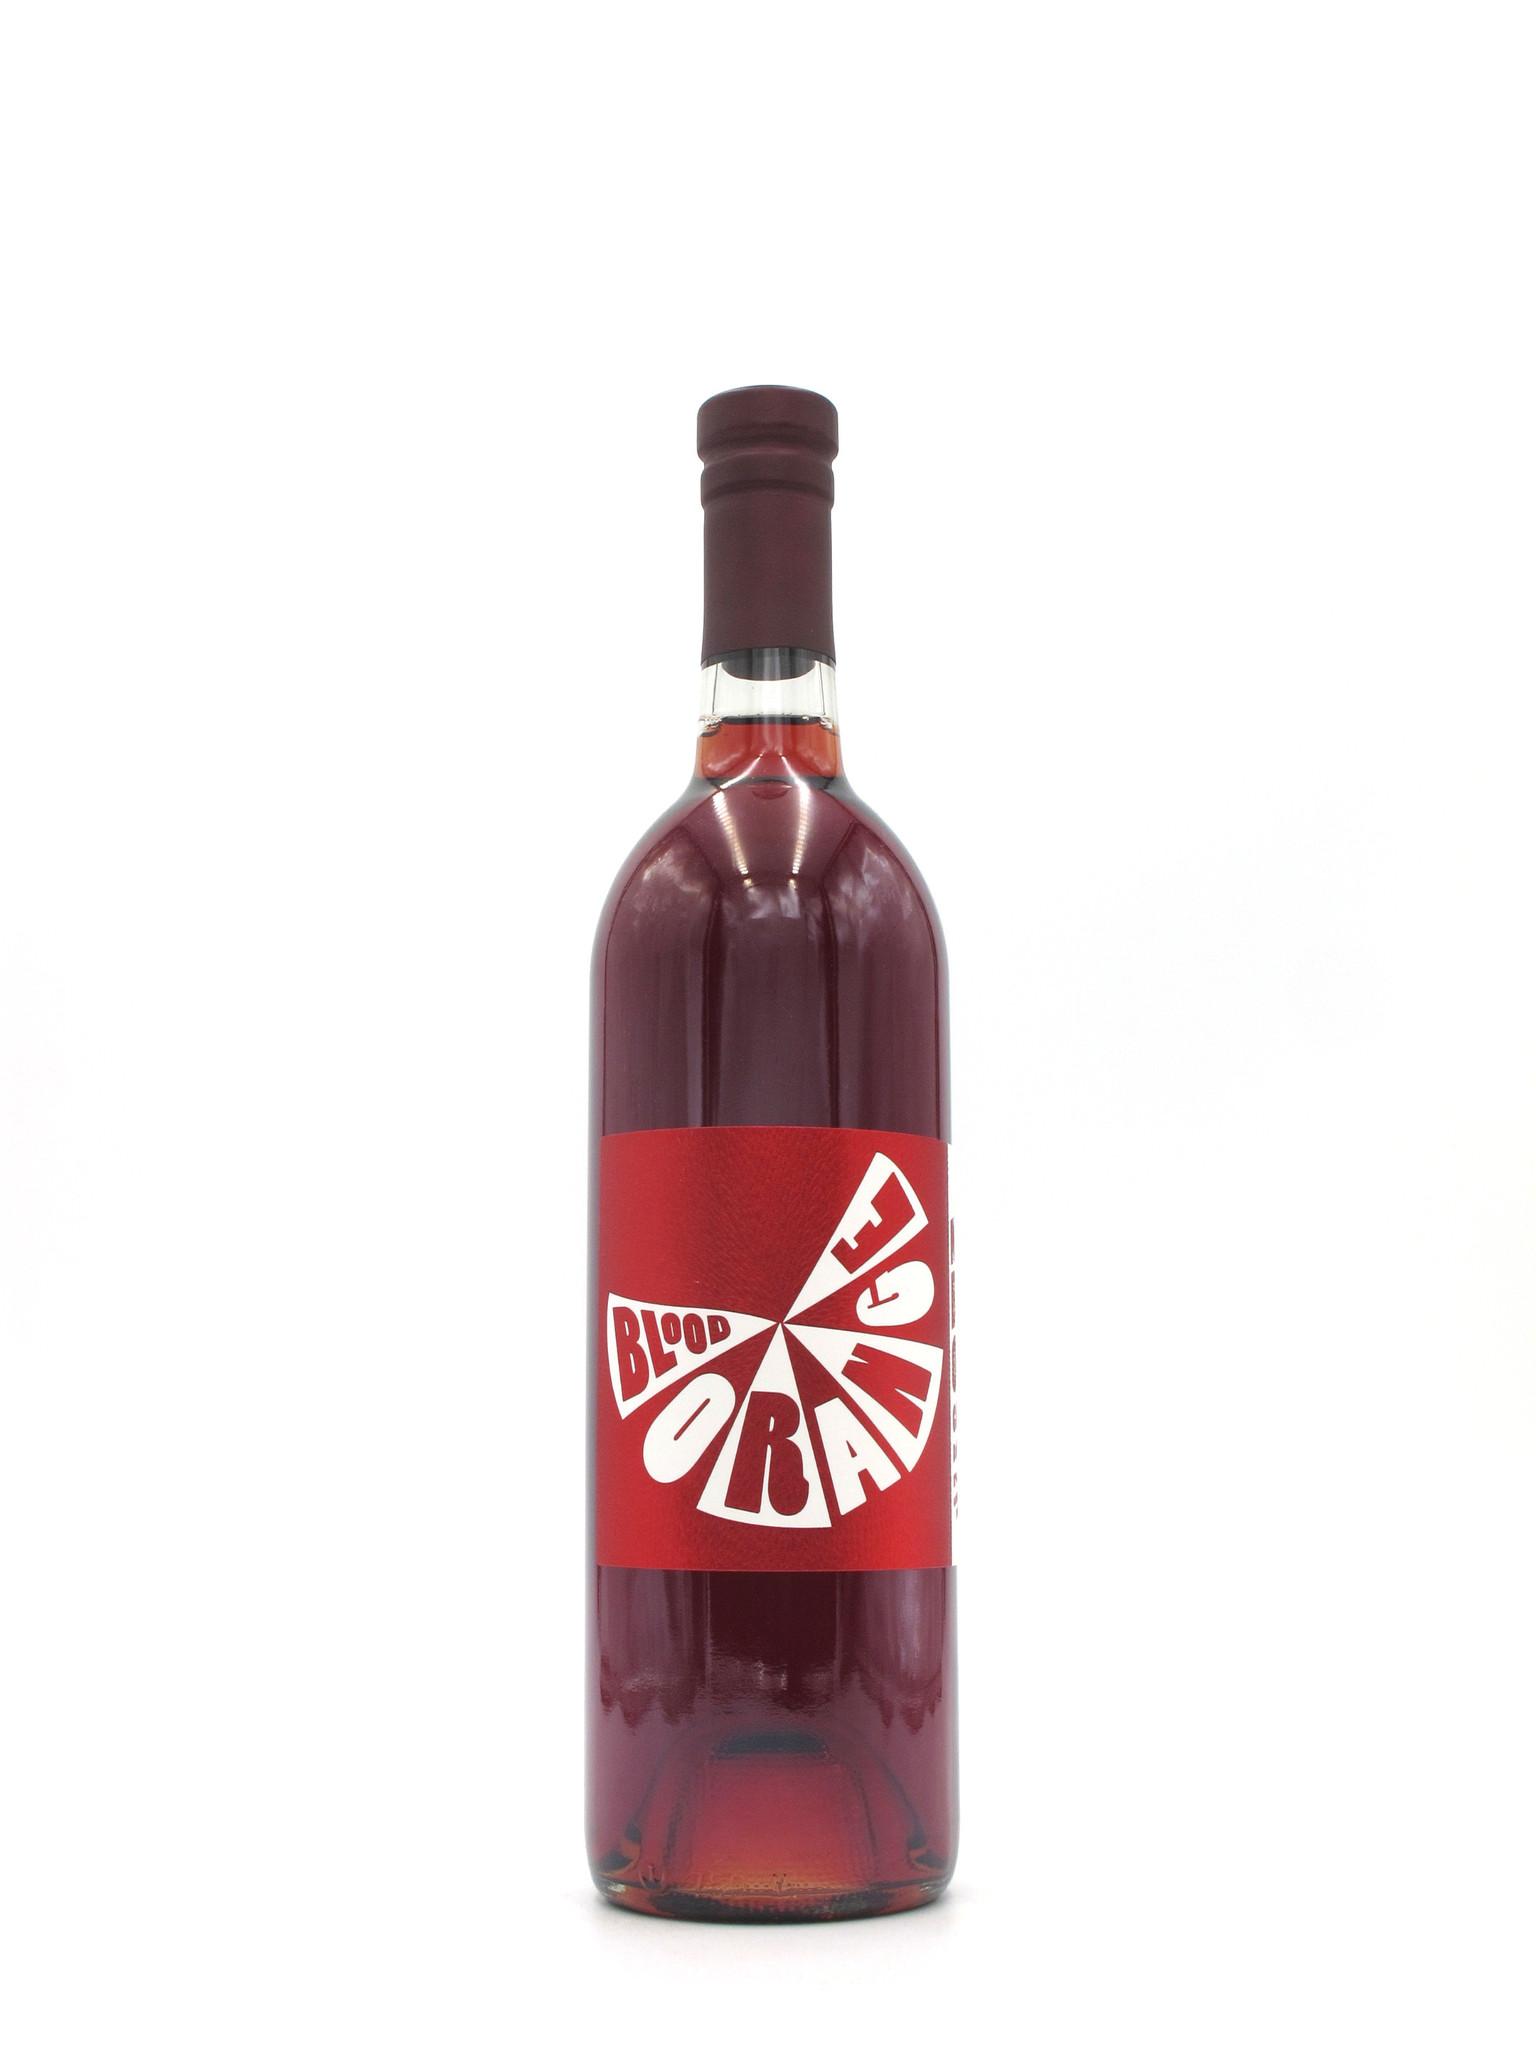 Mommenpop Mommenpop D'Sange Blood Orange Vermouth 750ml